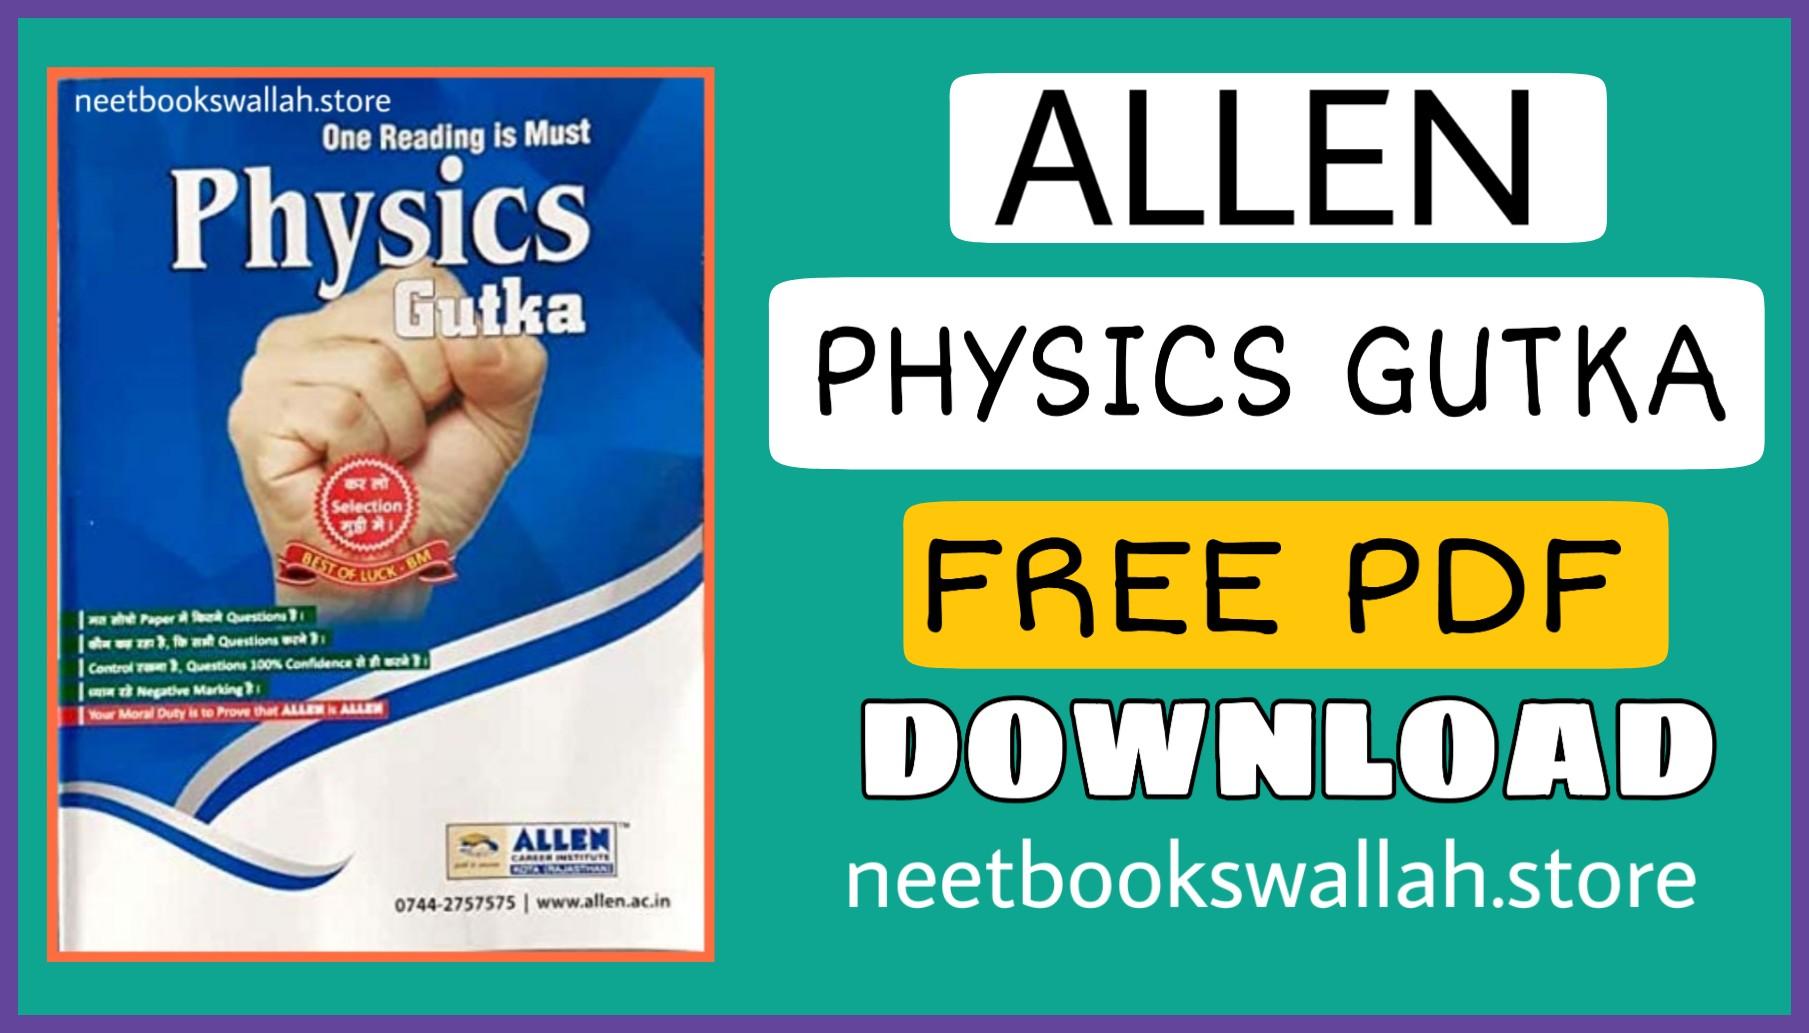 Allen Physics Gutka PDF Download, allen kota Physics gutka for neet, gutka for neet free download, allen gutka pdf download, allen gutka for neet/jee latest edition neet books wallah